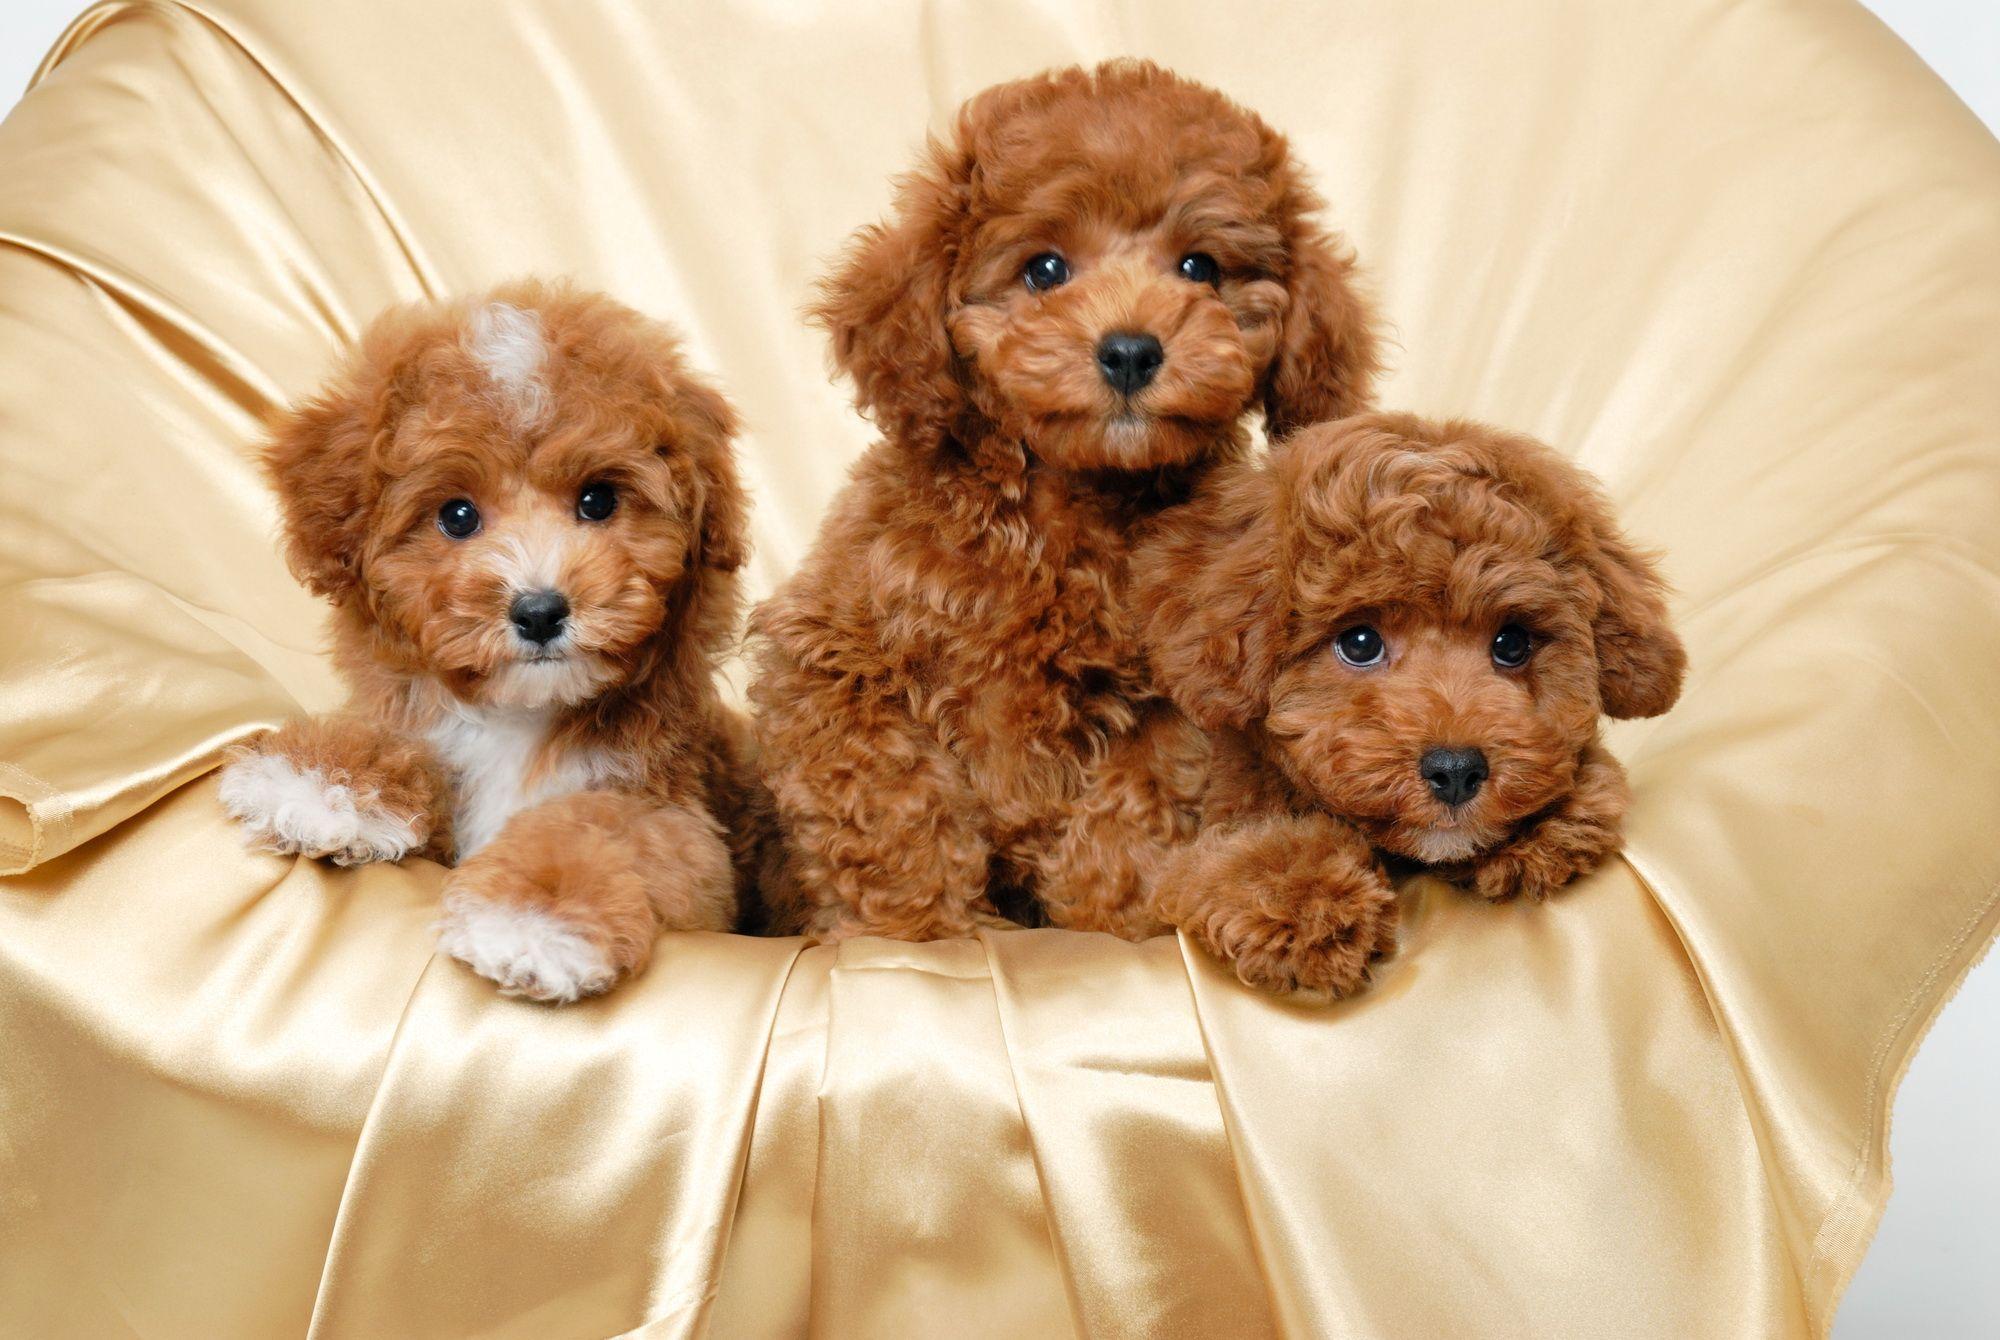 Hd Cute Puppies Wallpaper Download Free 104897